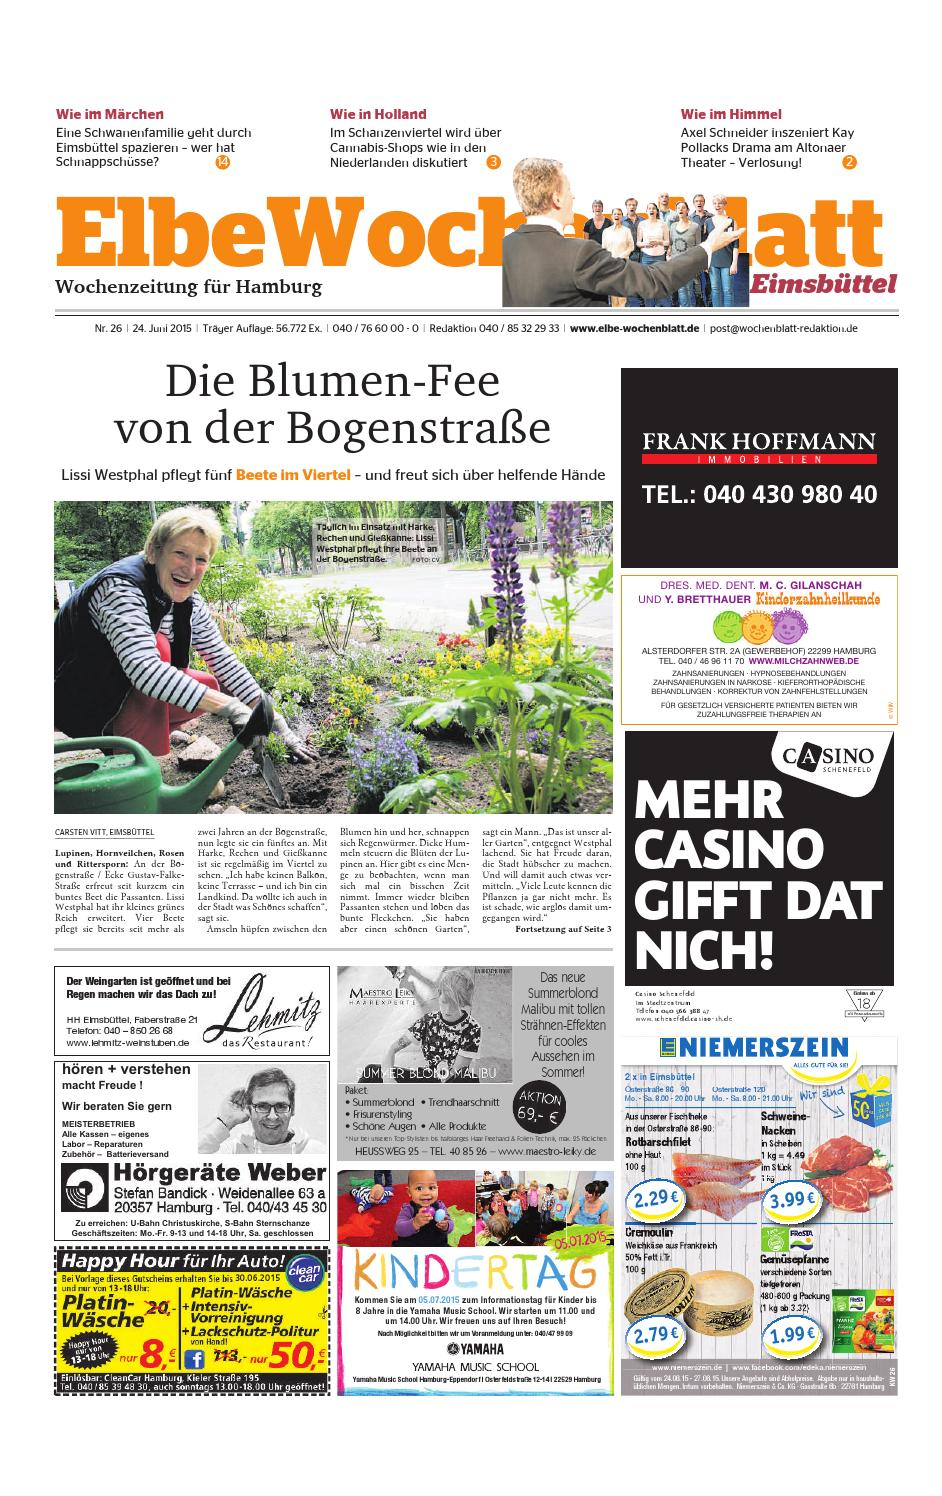 Eimsbüttel KW26-15 by Elbe Wochenblatt Verlagsgesellschaft mbH & Co.KG -  issuu